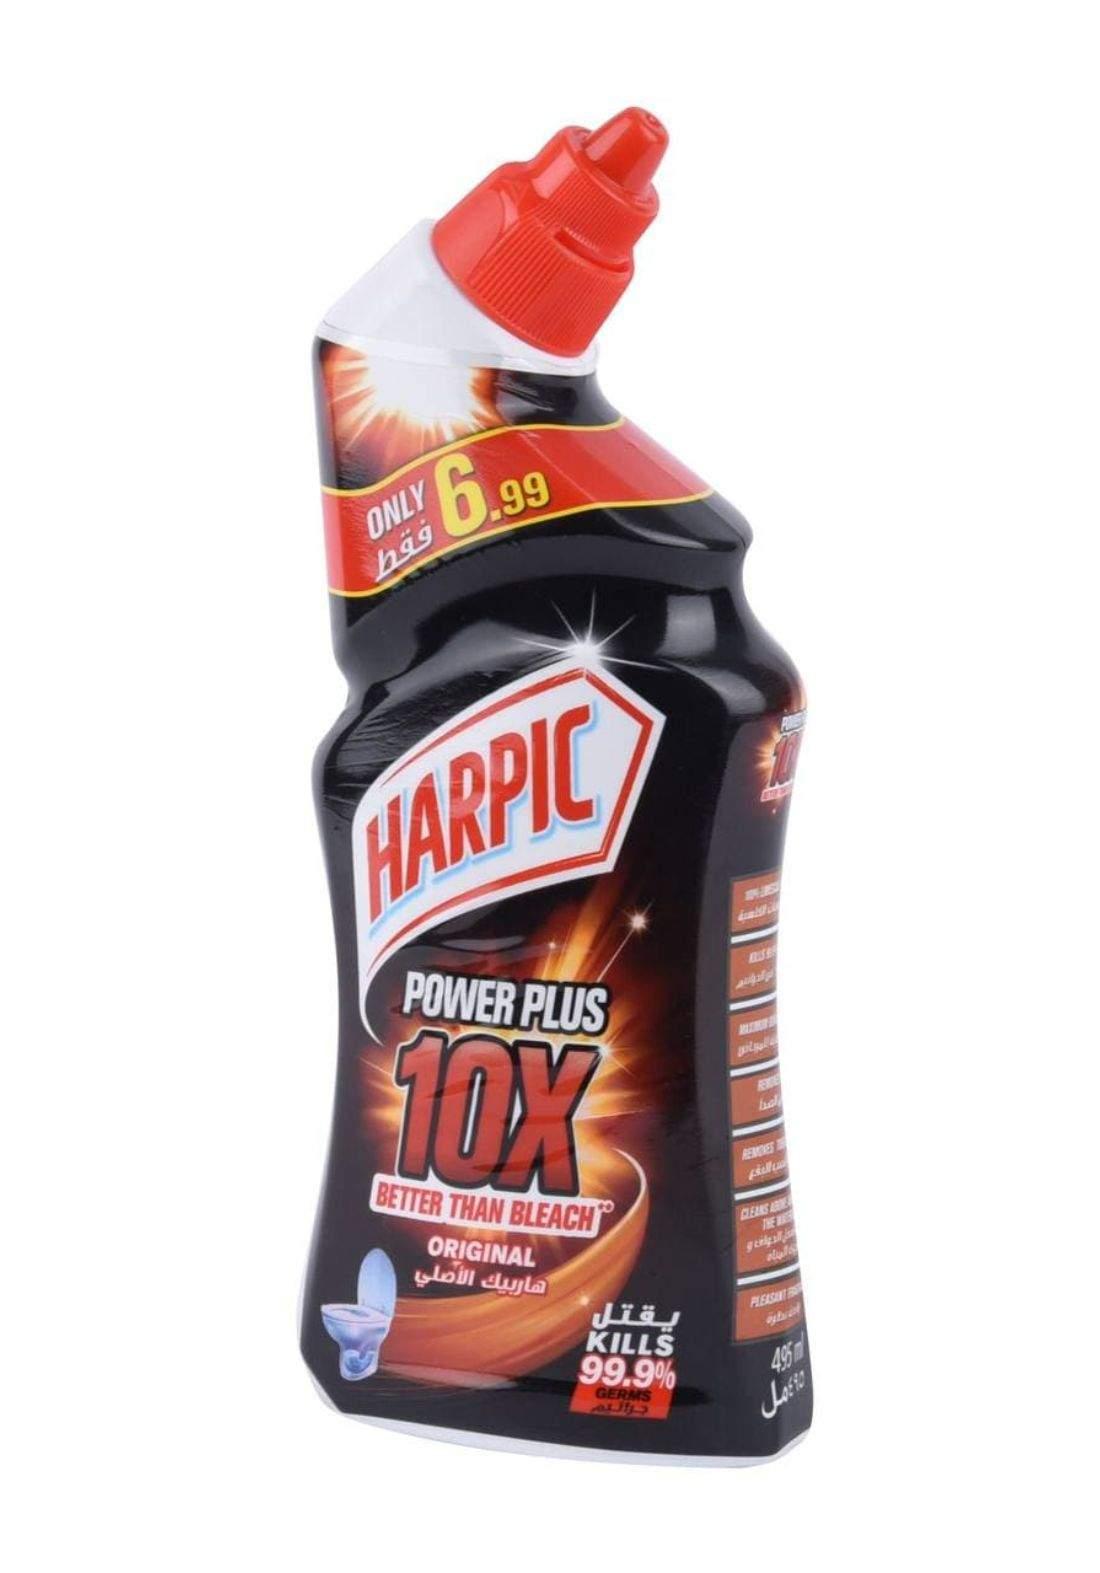 Harpic power plus 495 ml هاربيك بور بلاس